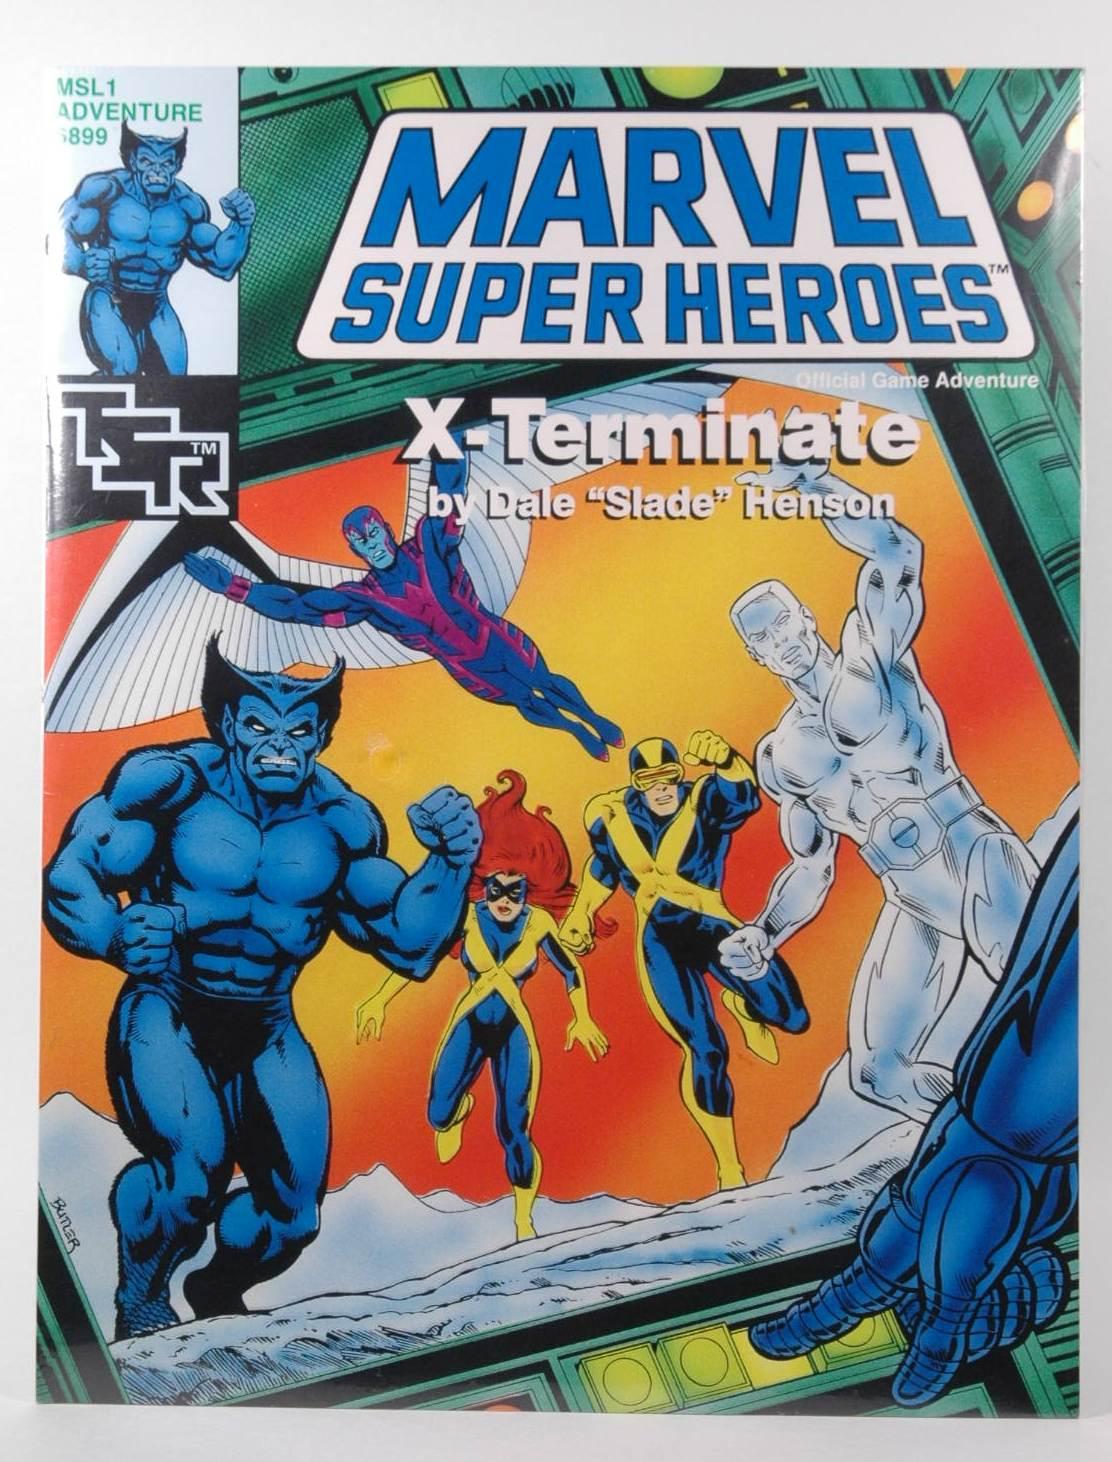 X-Terminate (Marvel Super Heroes Module MSL1) - Henson, Dale